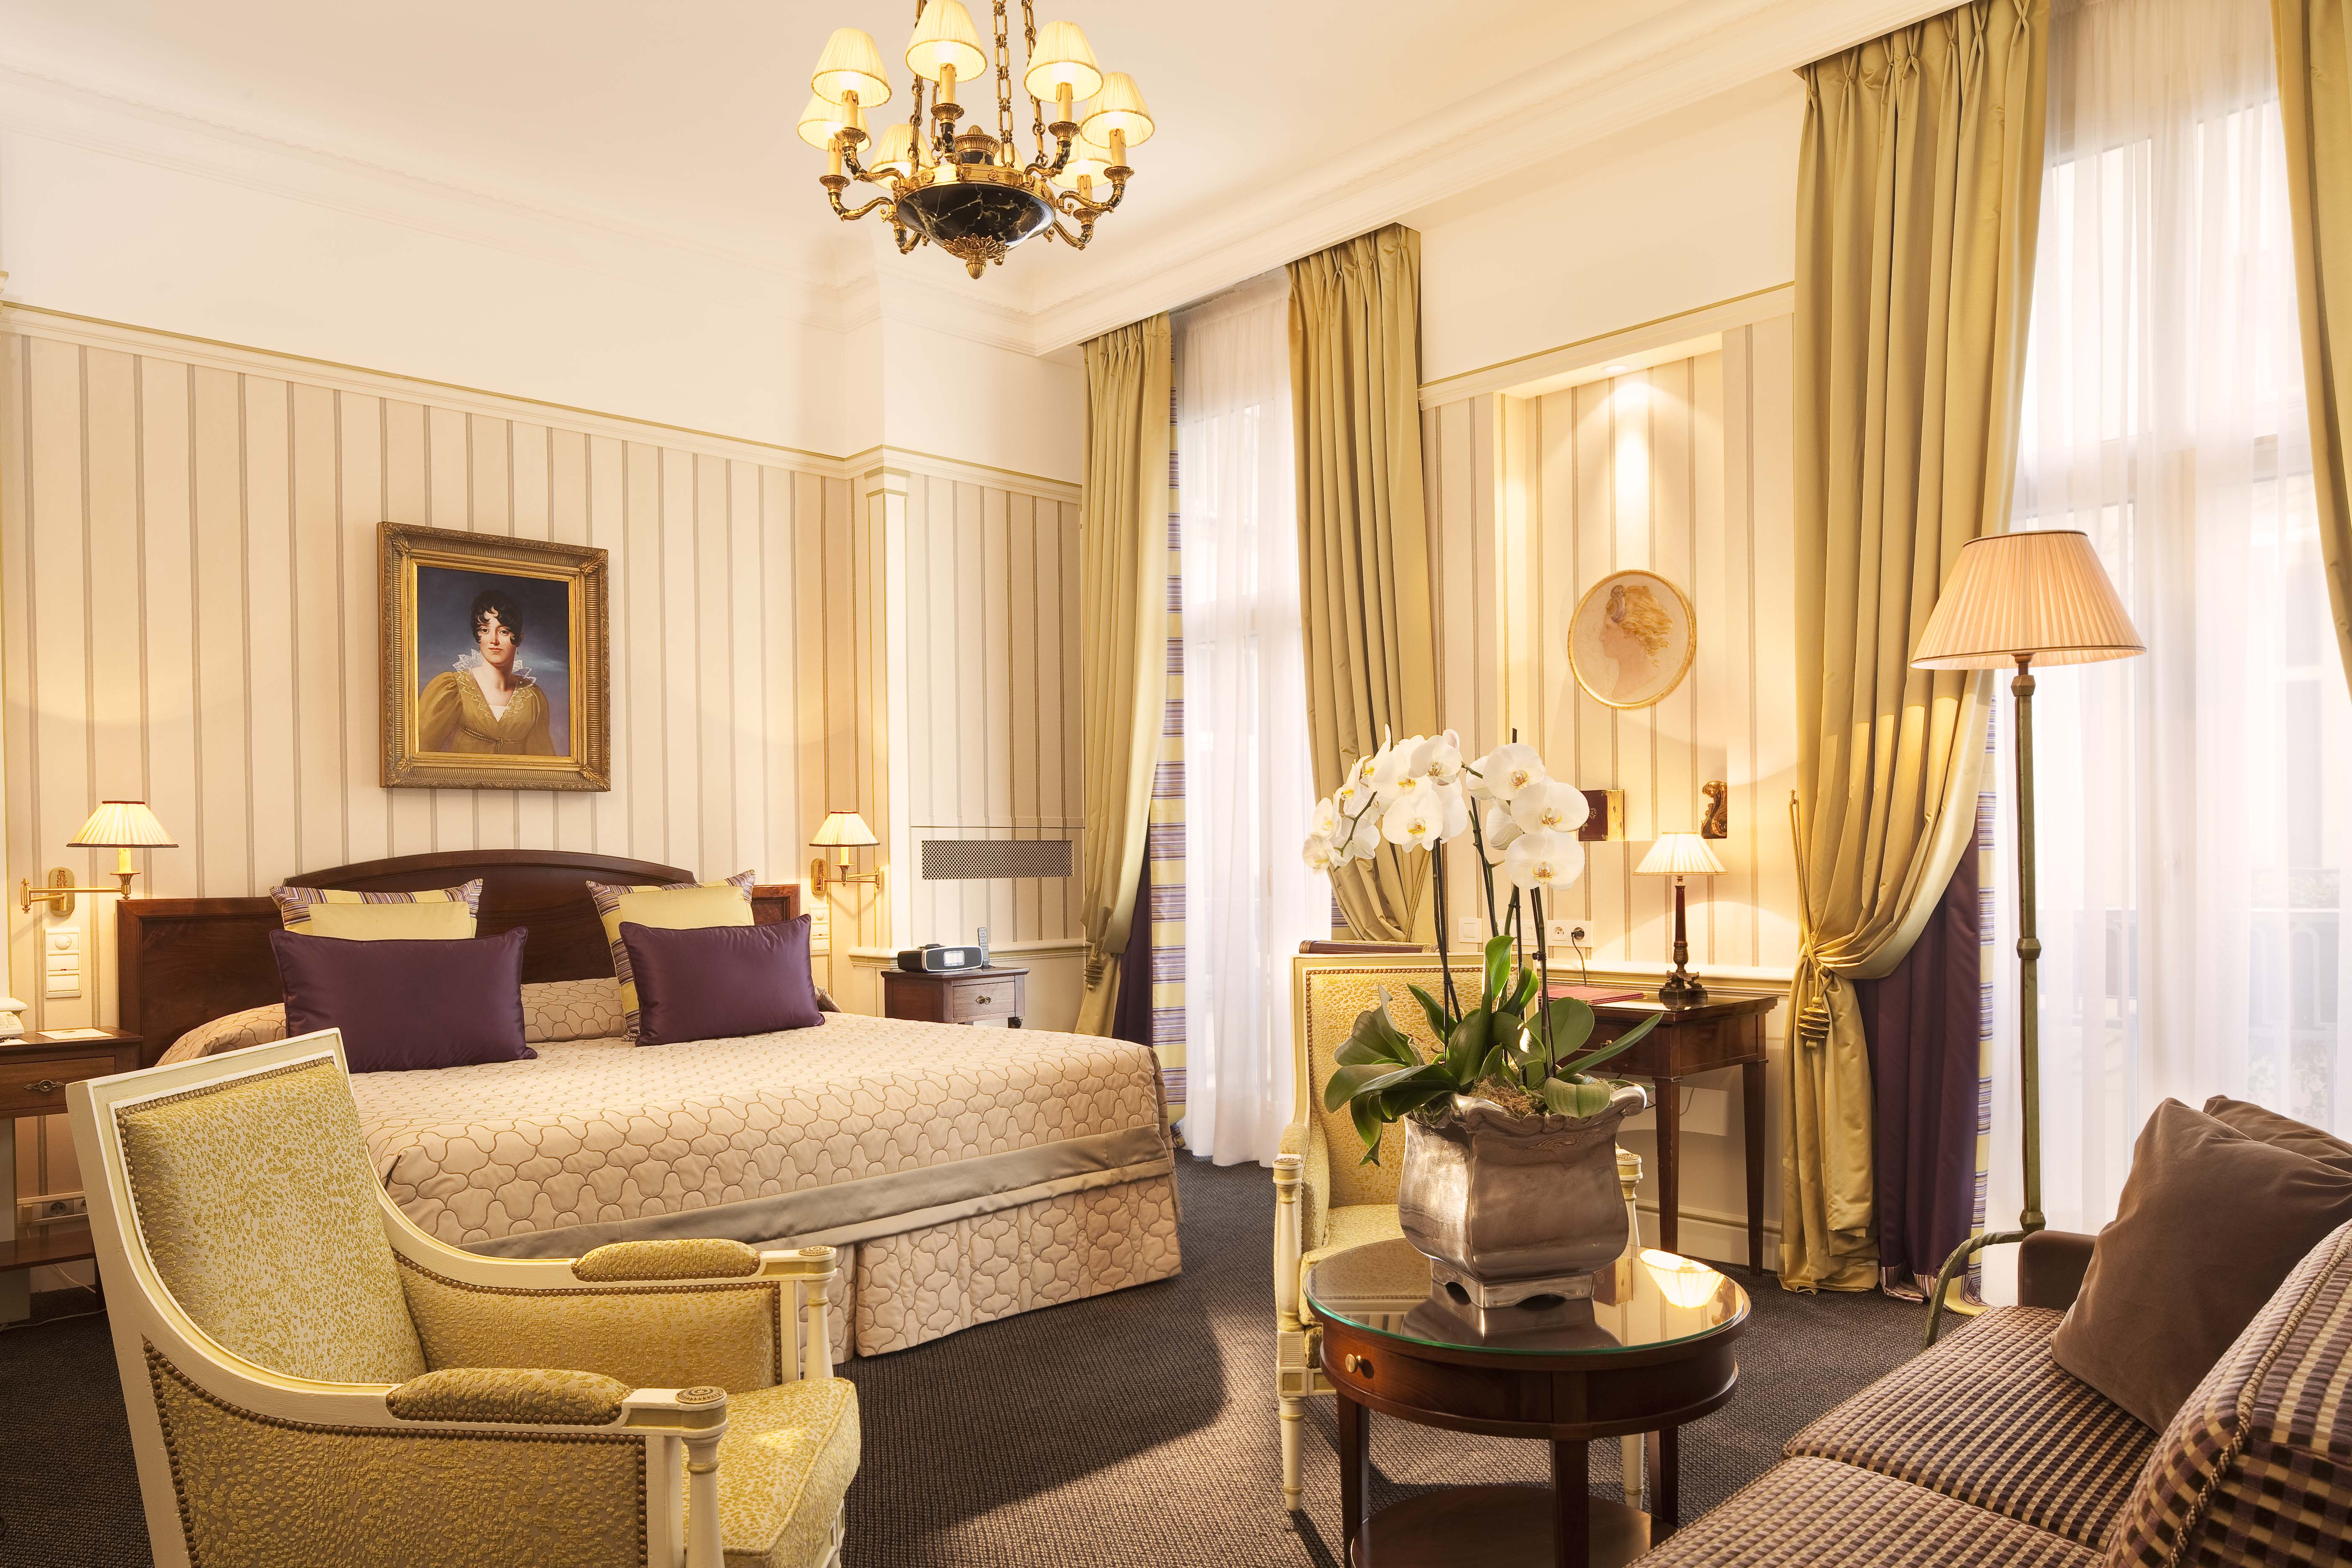 Image Courtesy of Hotel Napoleon, Paris.